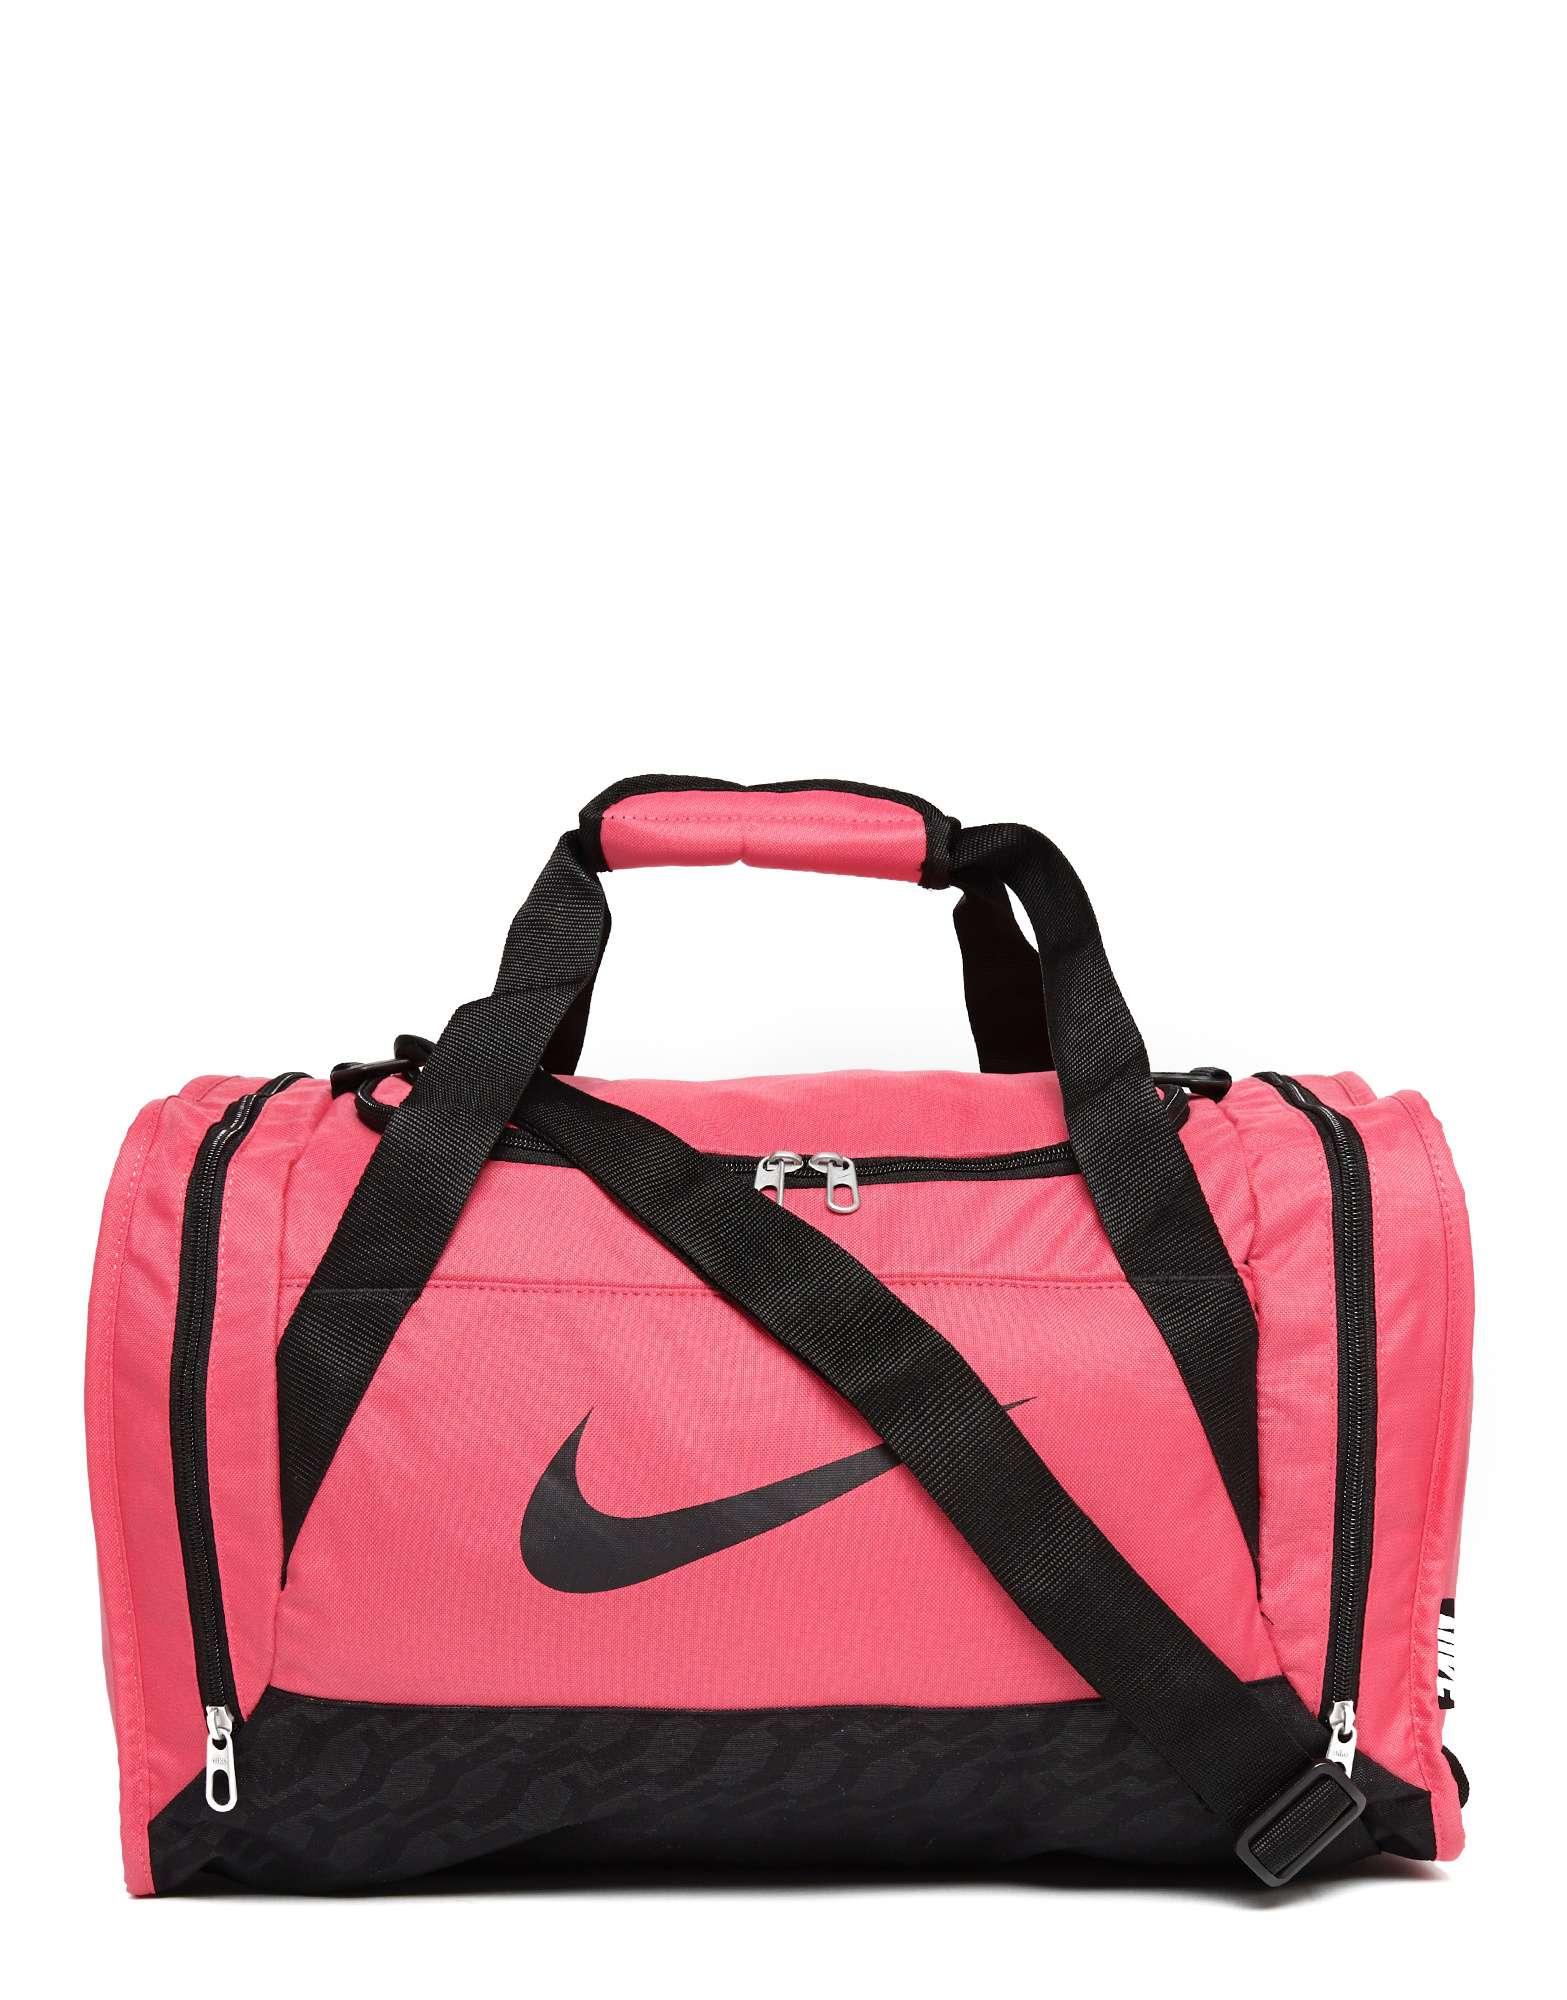 Taille Sac Femme Sport De Nike S Brasilia 5 WRFCxn